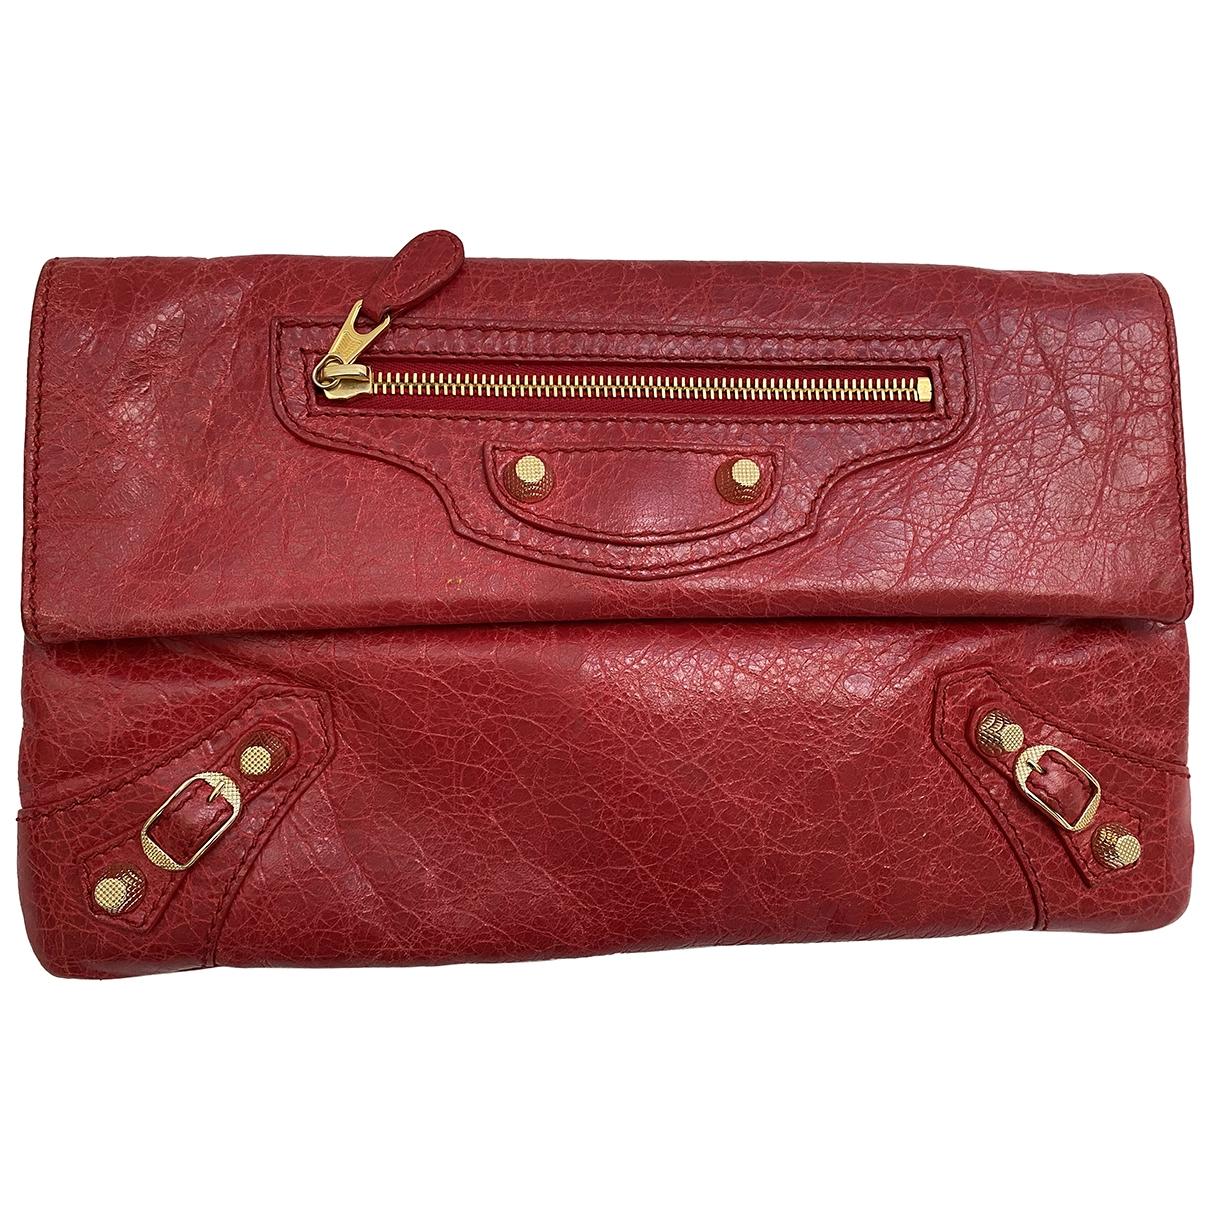 Balenciaga Envelop Clutch in  Rot Leder